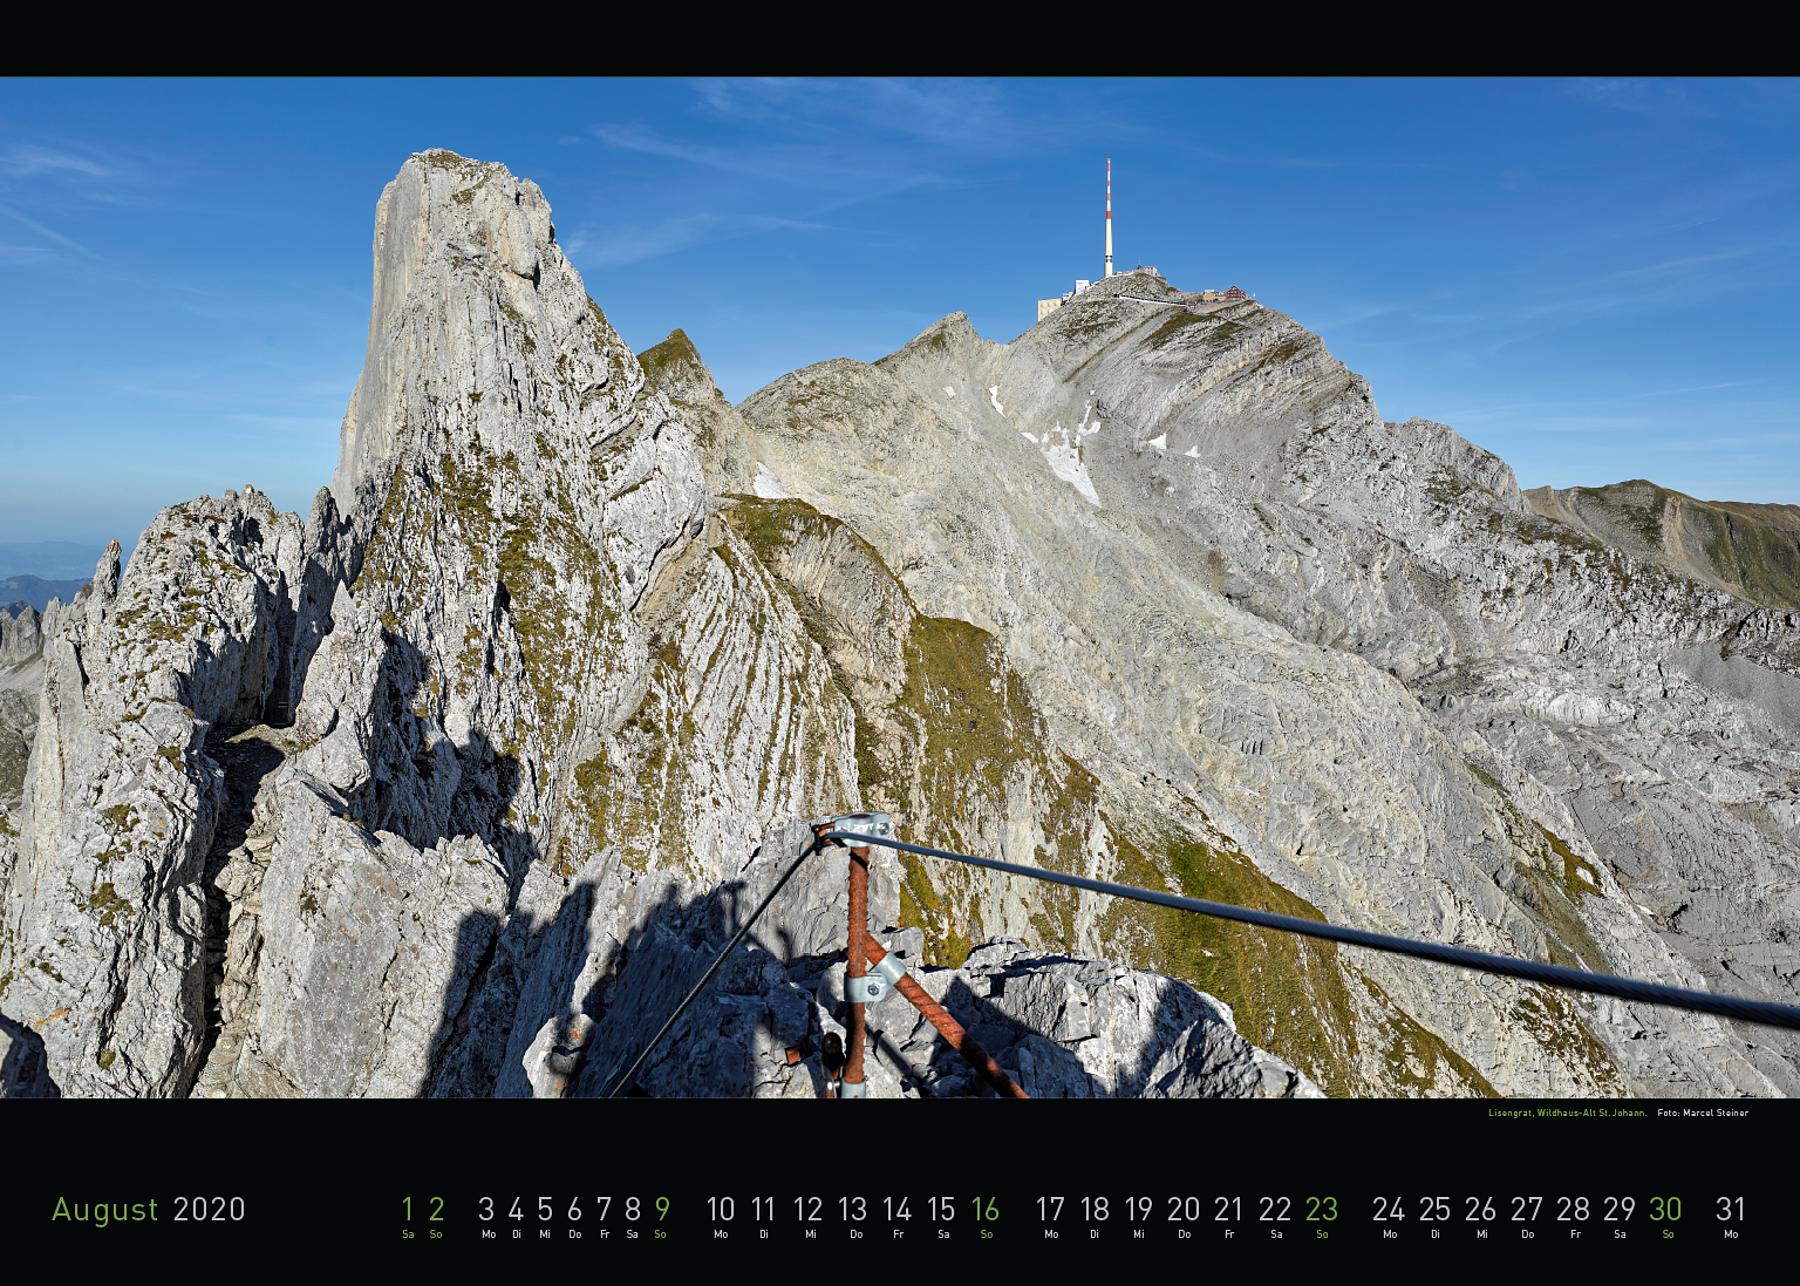 Panorama Appenzellerland 2020 August